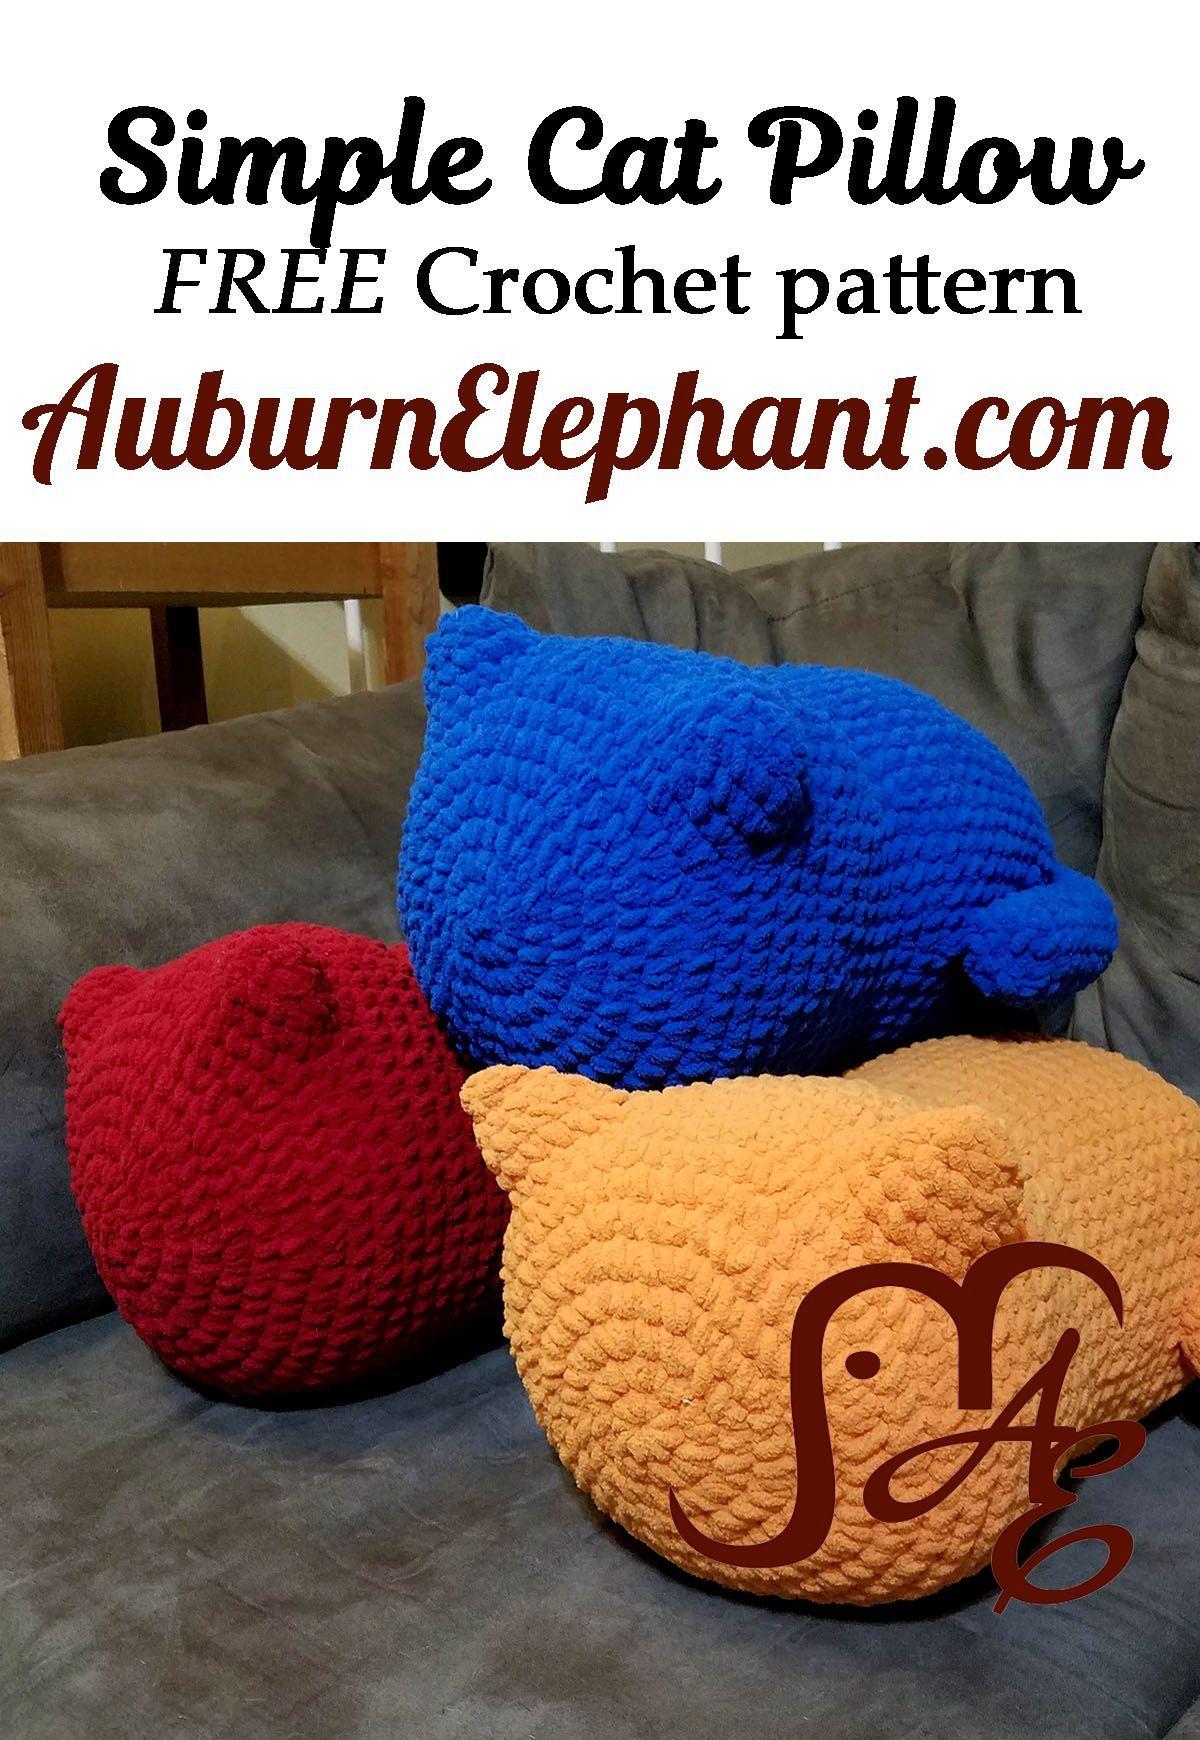 Pin on Free Knitting Patterns | 1740x1200